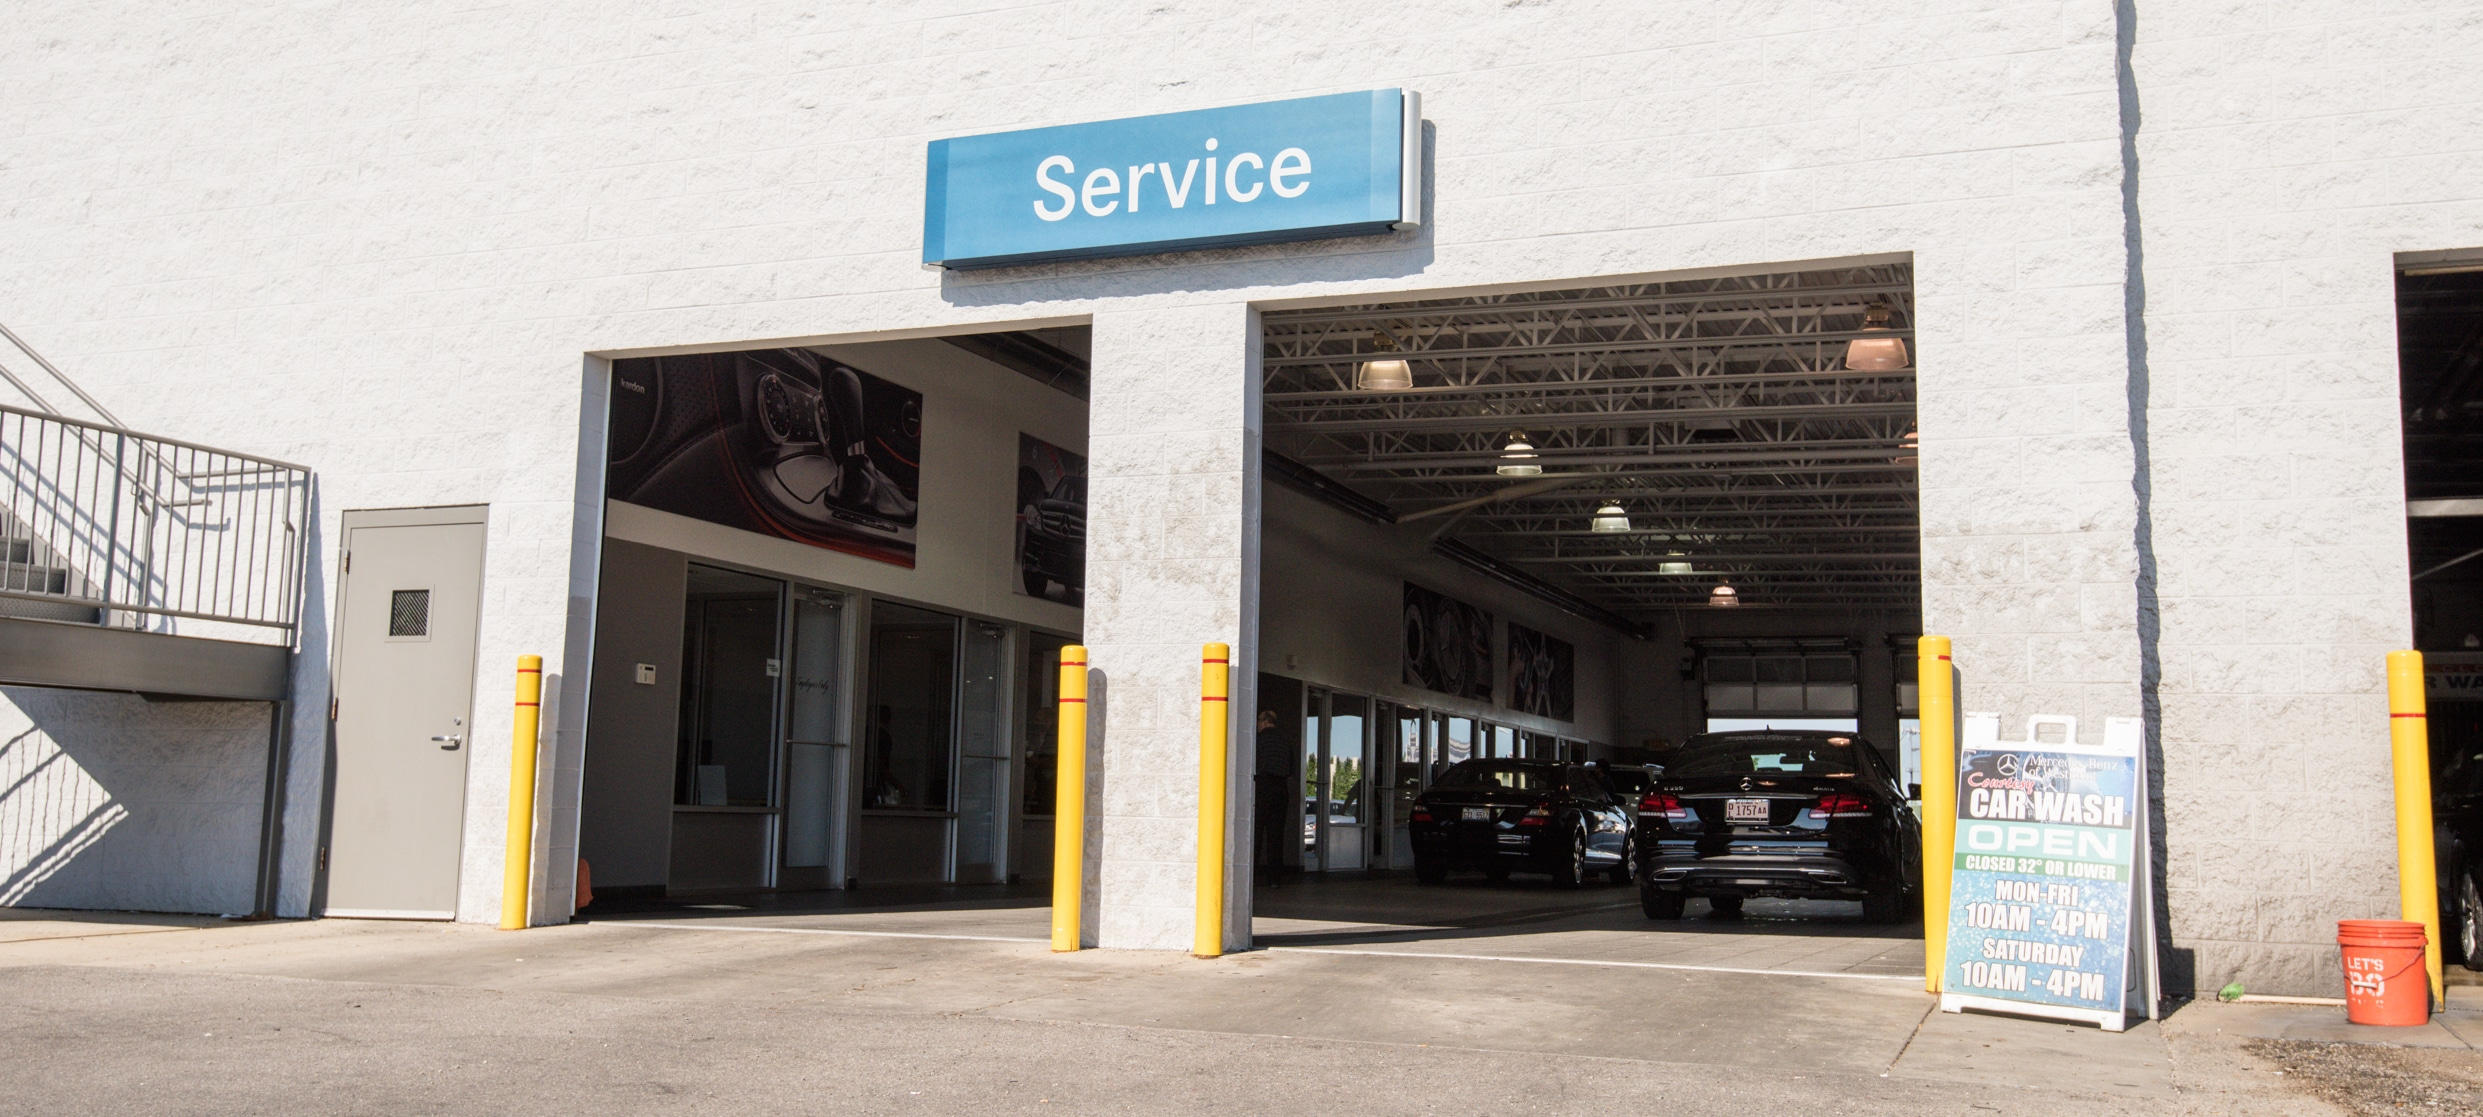 mercedes-benz service westmont, il | mercedes-benz of westmont